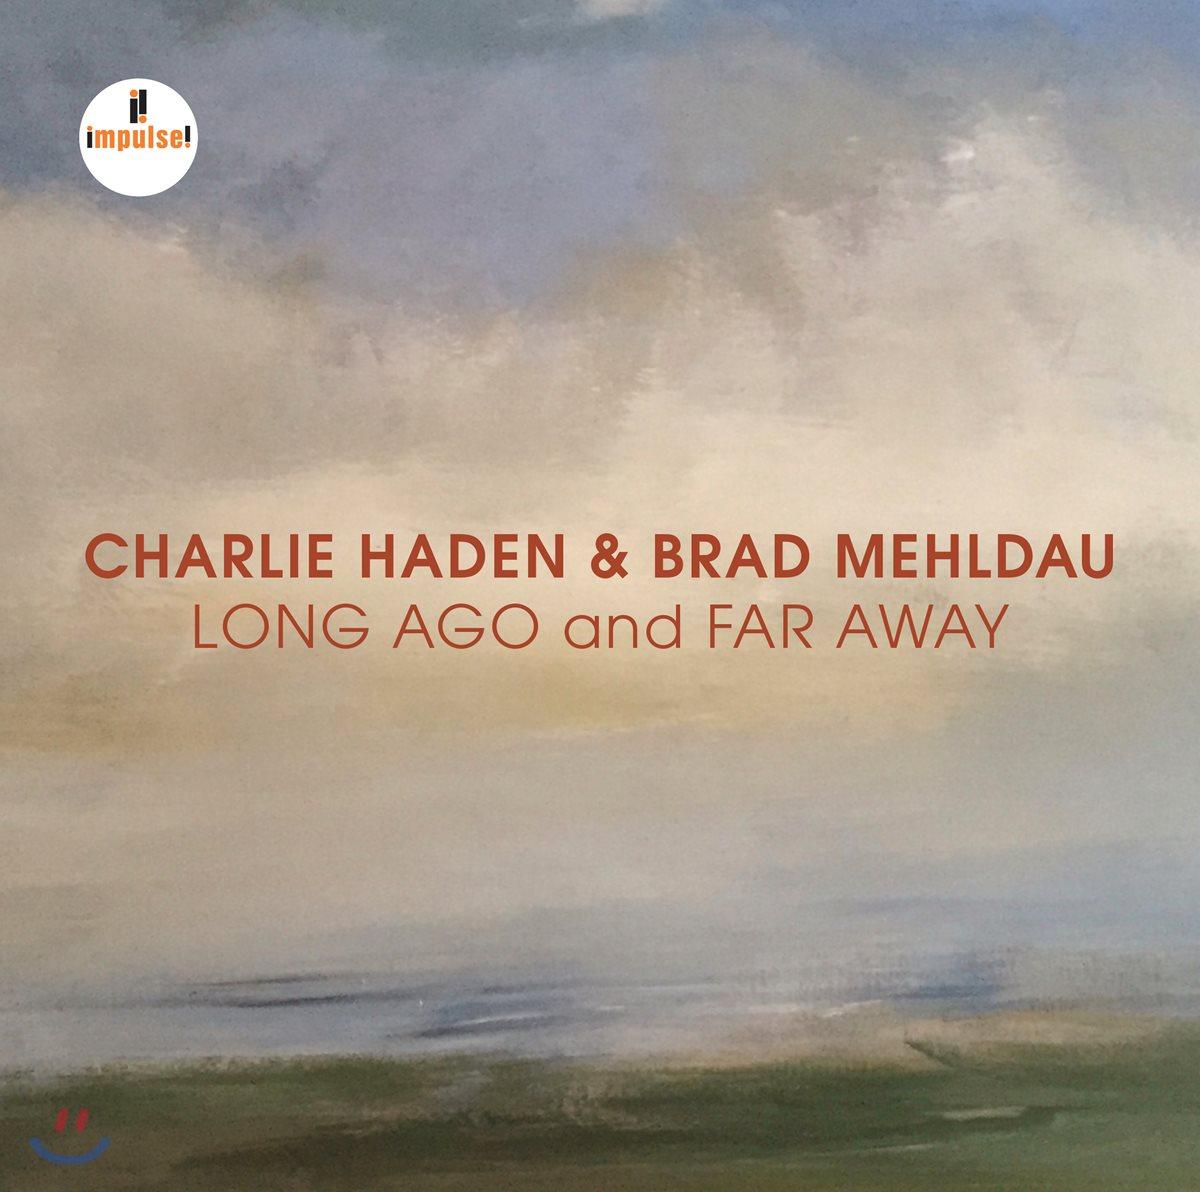 Charlie Haden / Brad Mehldau - Long Ago & Far Away 찰리 헤이든, 브래드 멜다우 2007년 라이브